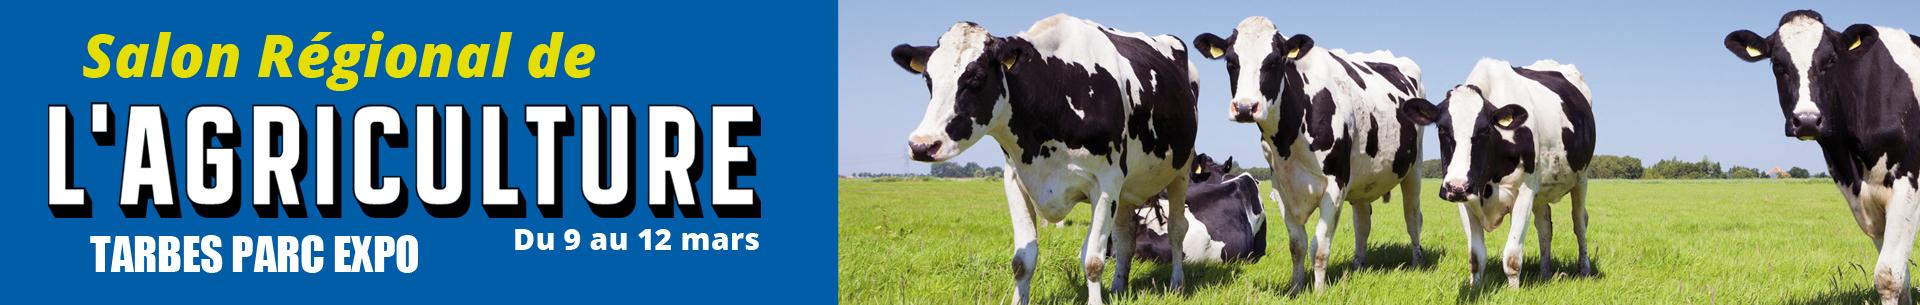 Salon de l 39 agriculture tarbes salon agricole tarbes 2018 - Salon de l agriculture materiel agricole ...